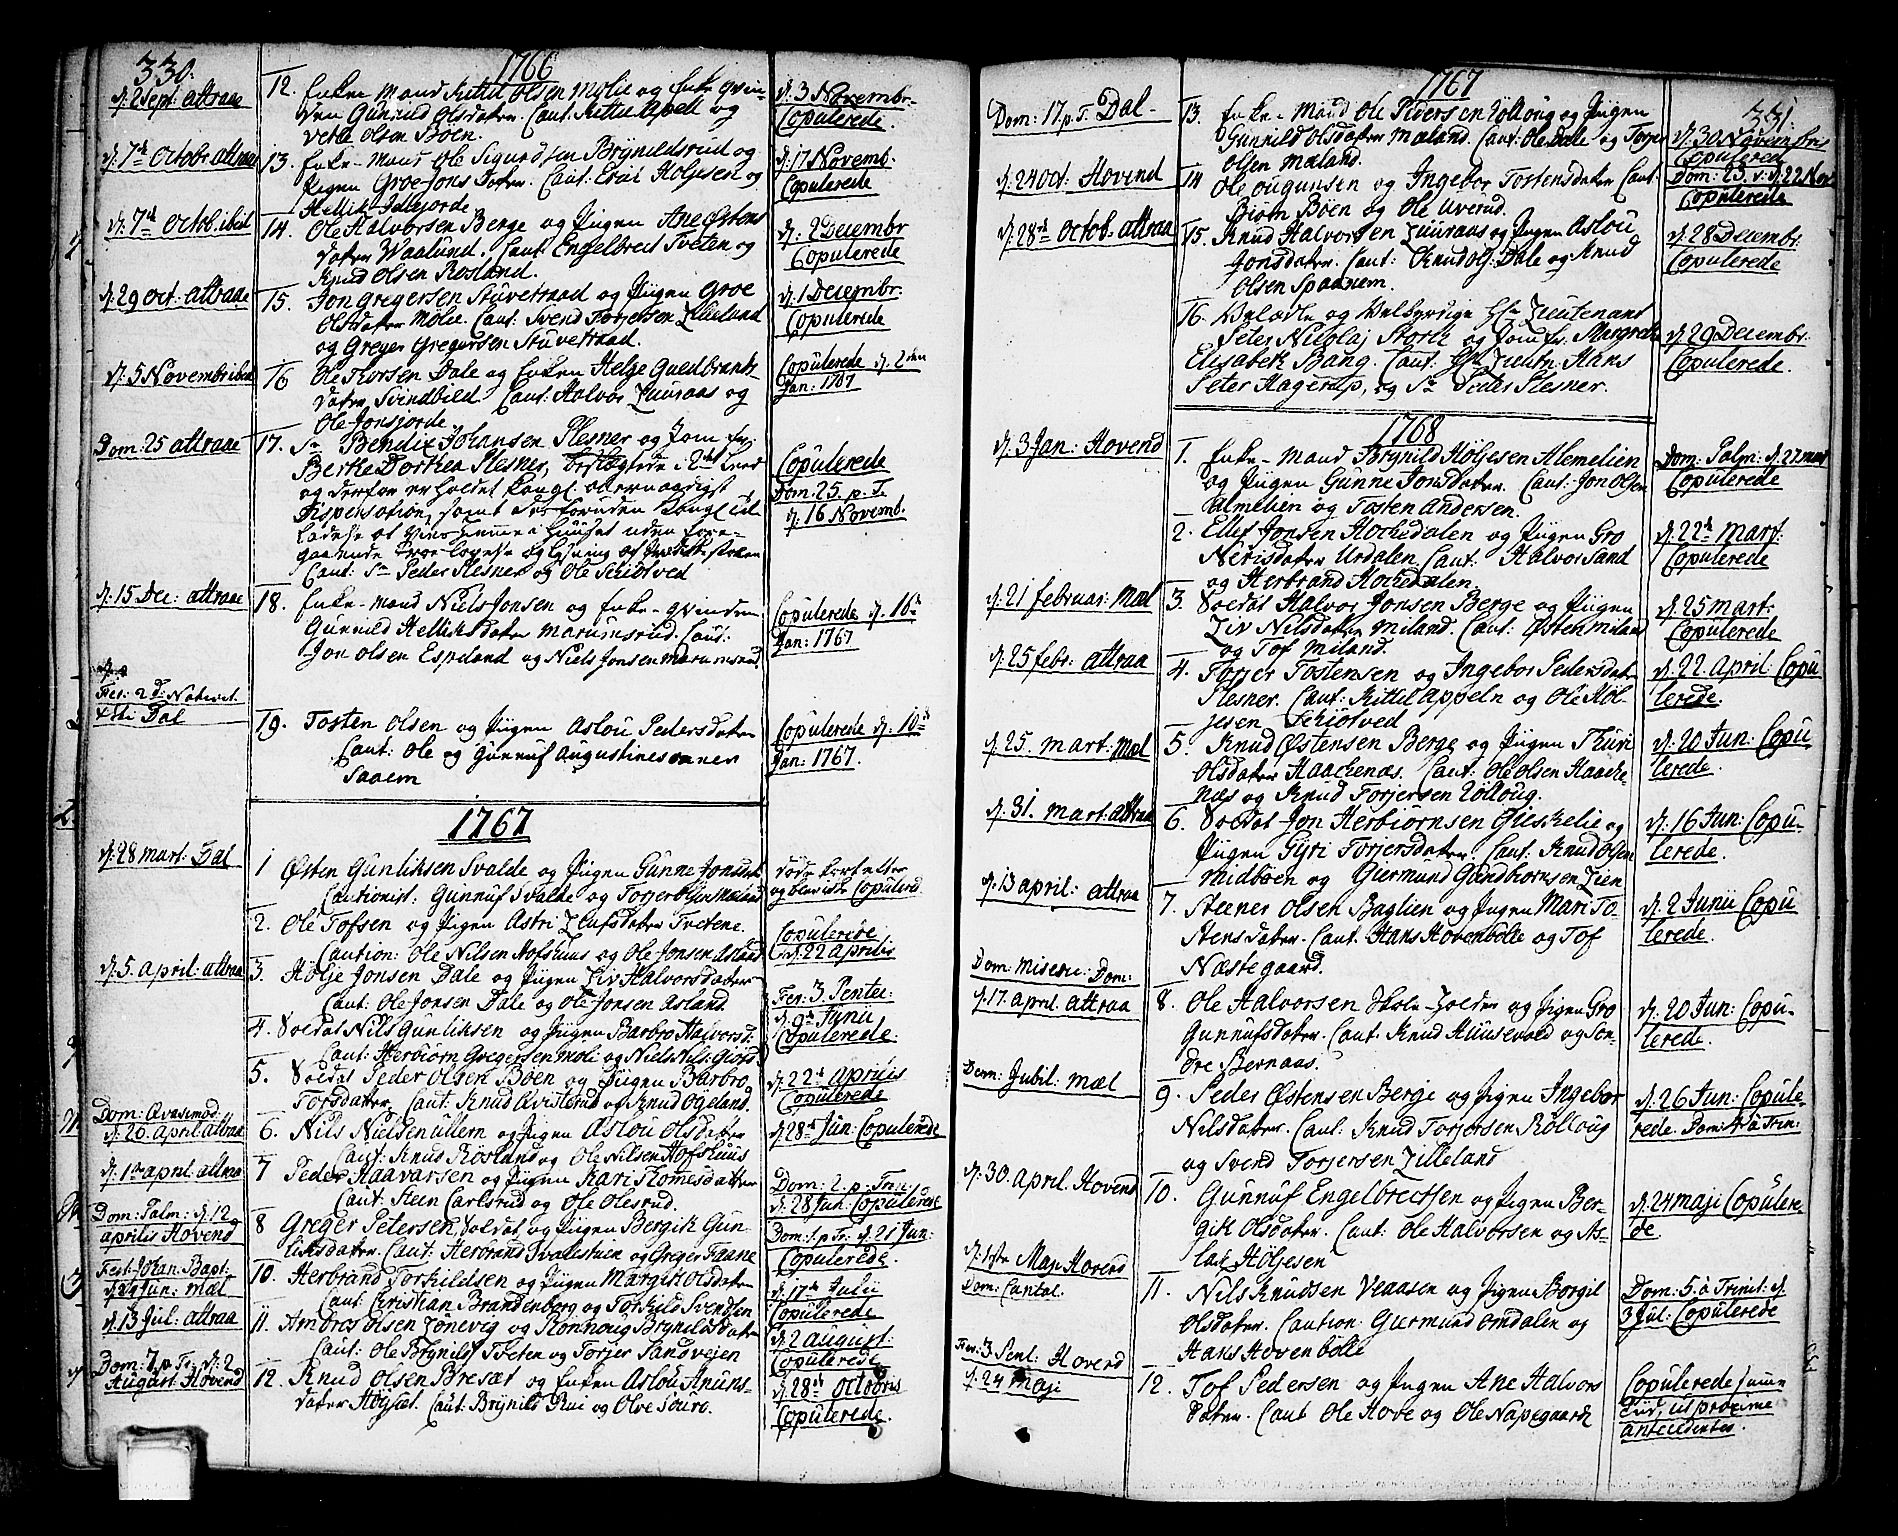 SAKO, Tinn kirkebøker, F/Fa/L0002: Ministerialbok nr. I 2, 1757-1810, s. 330-331